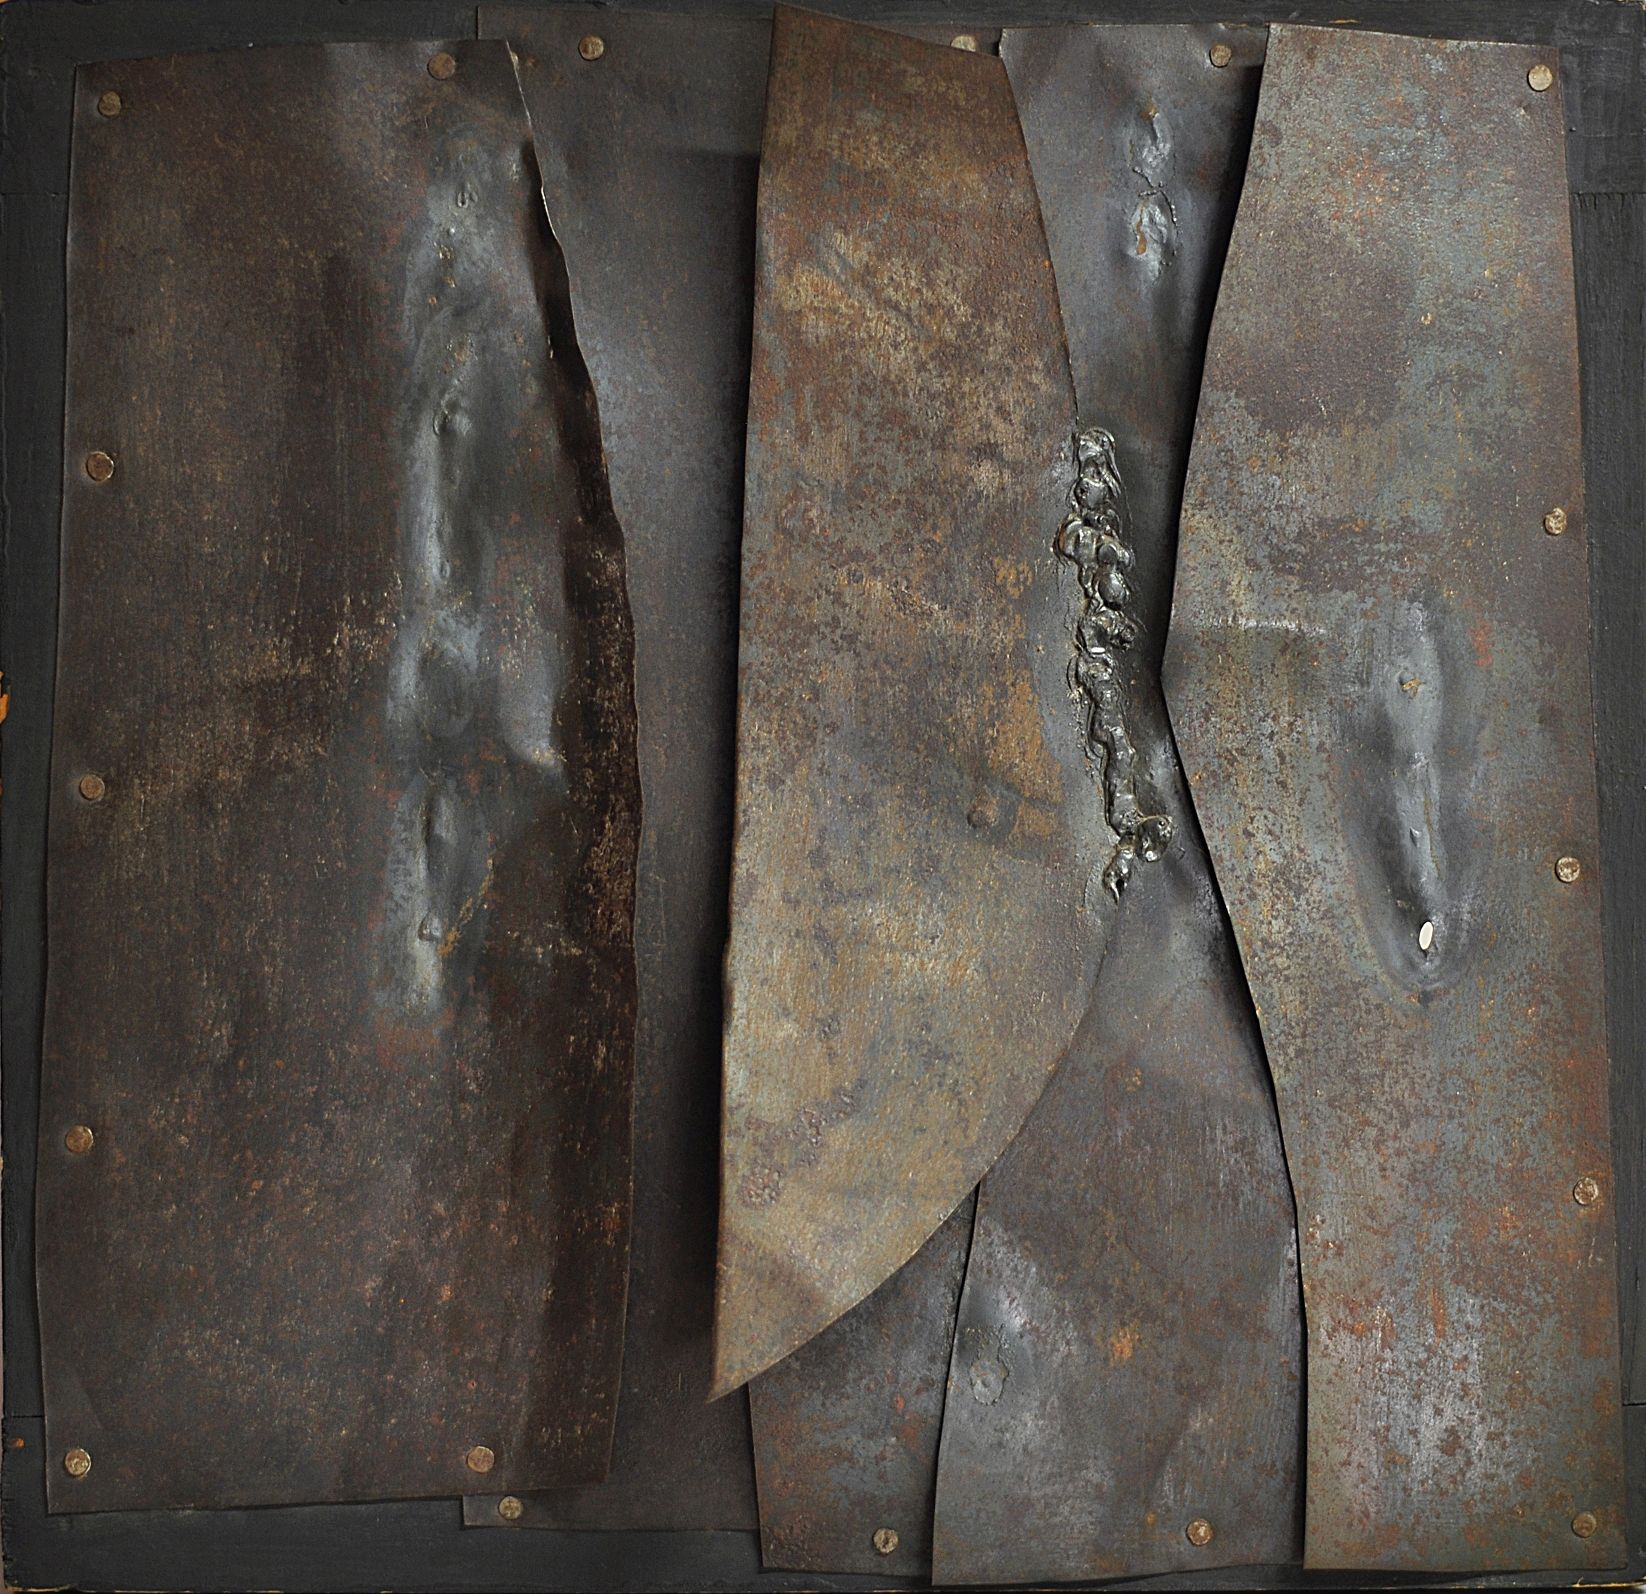 Alberto Burri, Iron, 1960